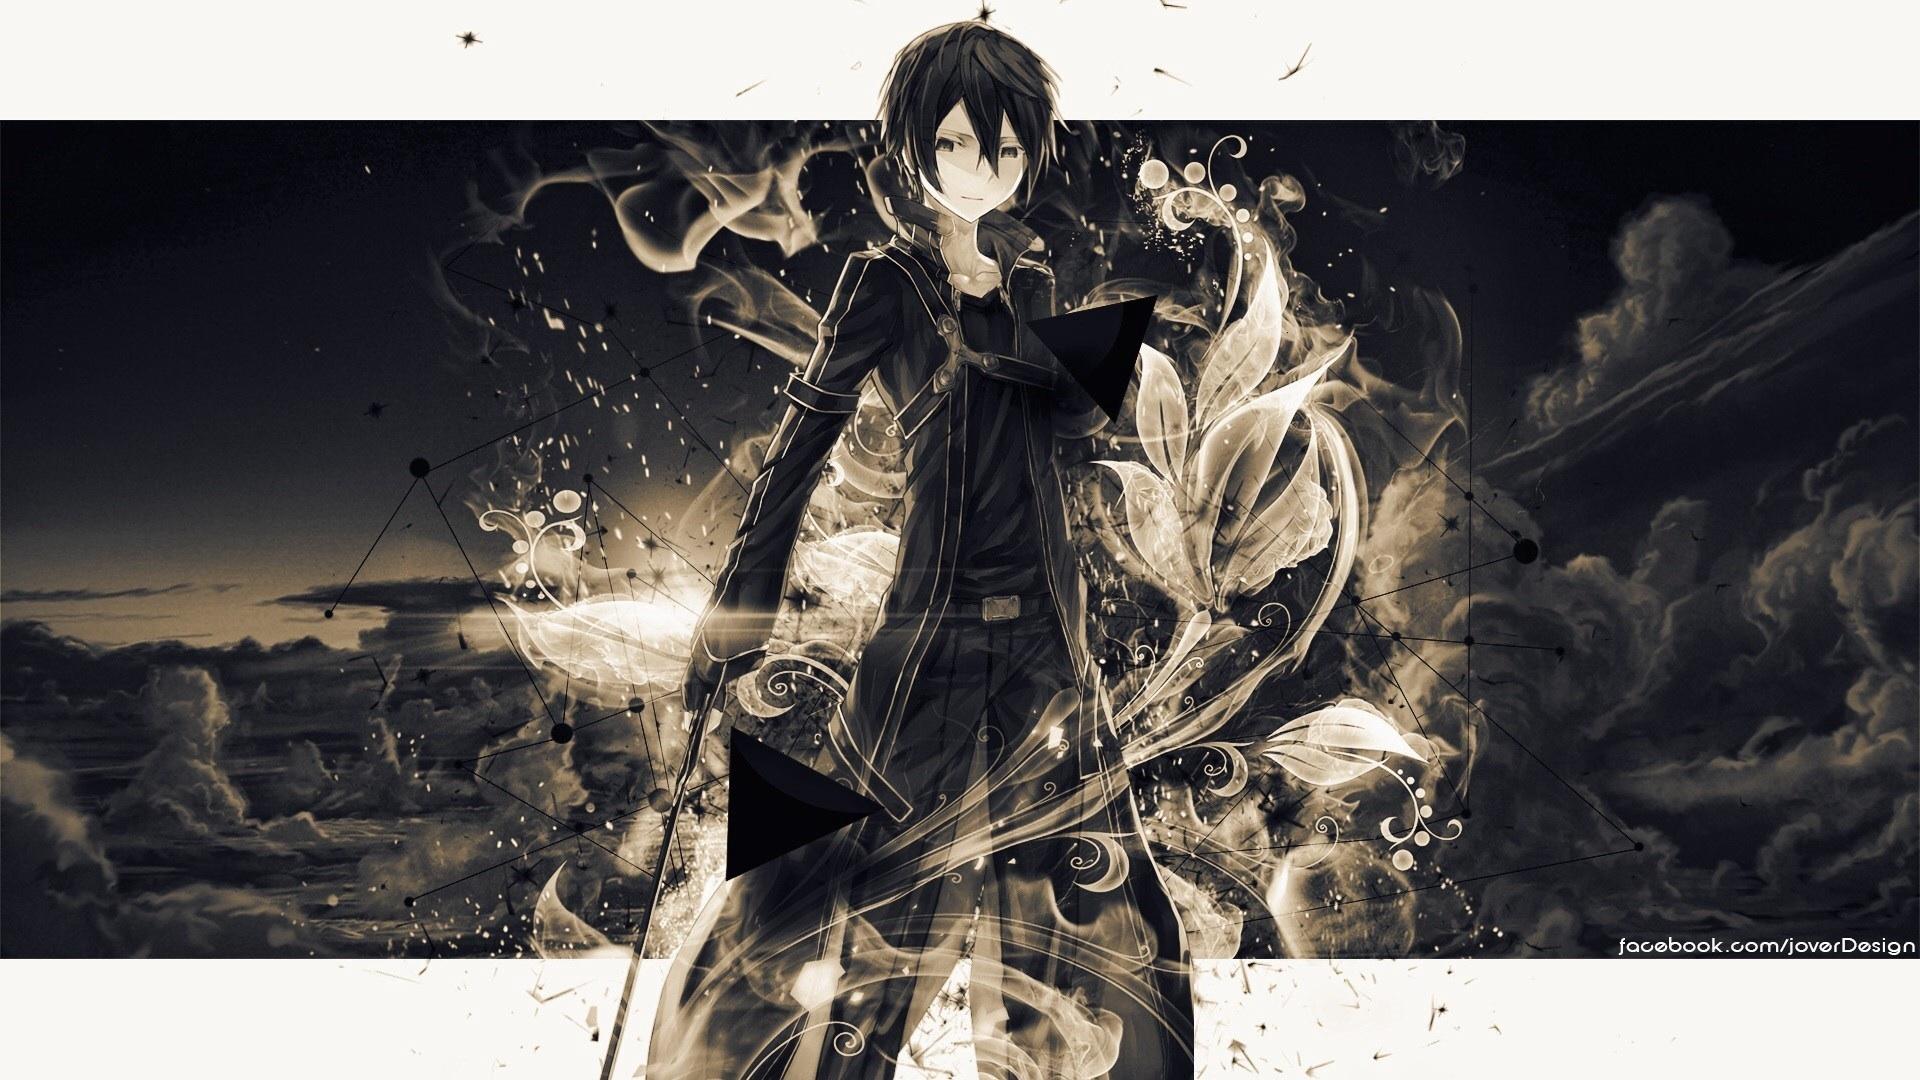 Kirito-and-Asuna-Sword-Art-Online-1920x1080-wallpaper-wp3607702